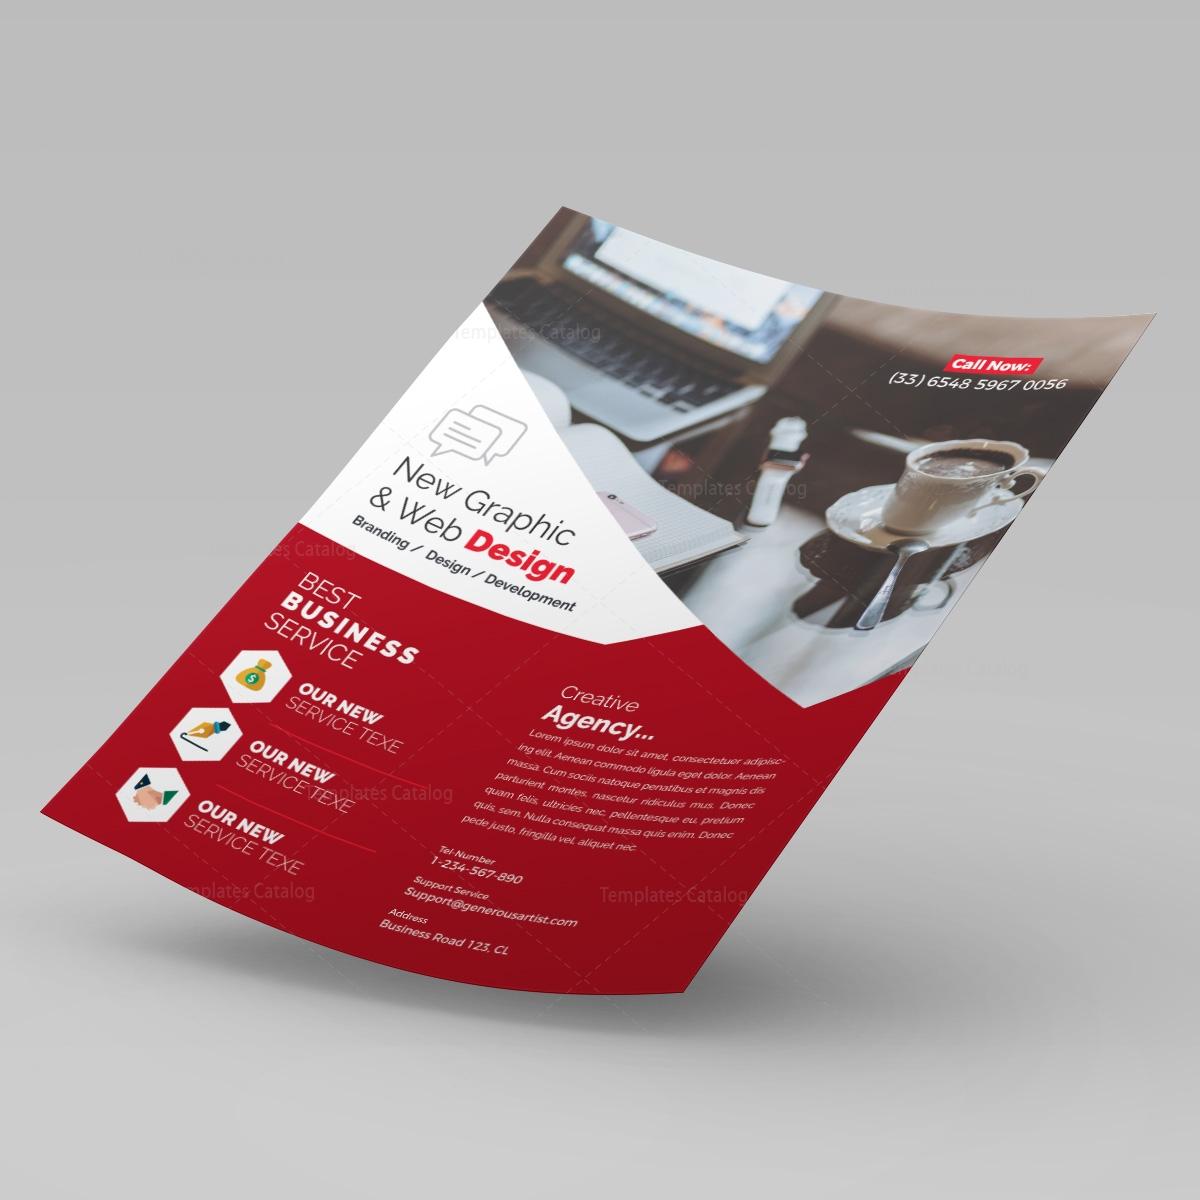 web design flyer template 000240 template catalog